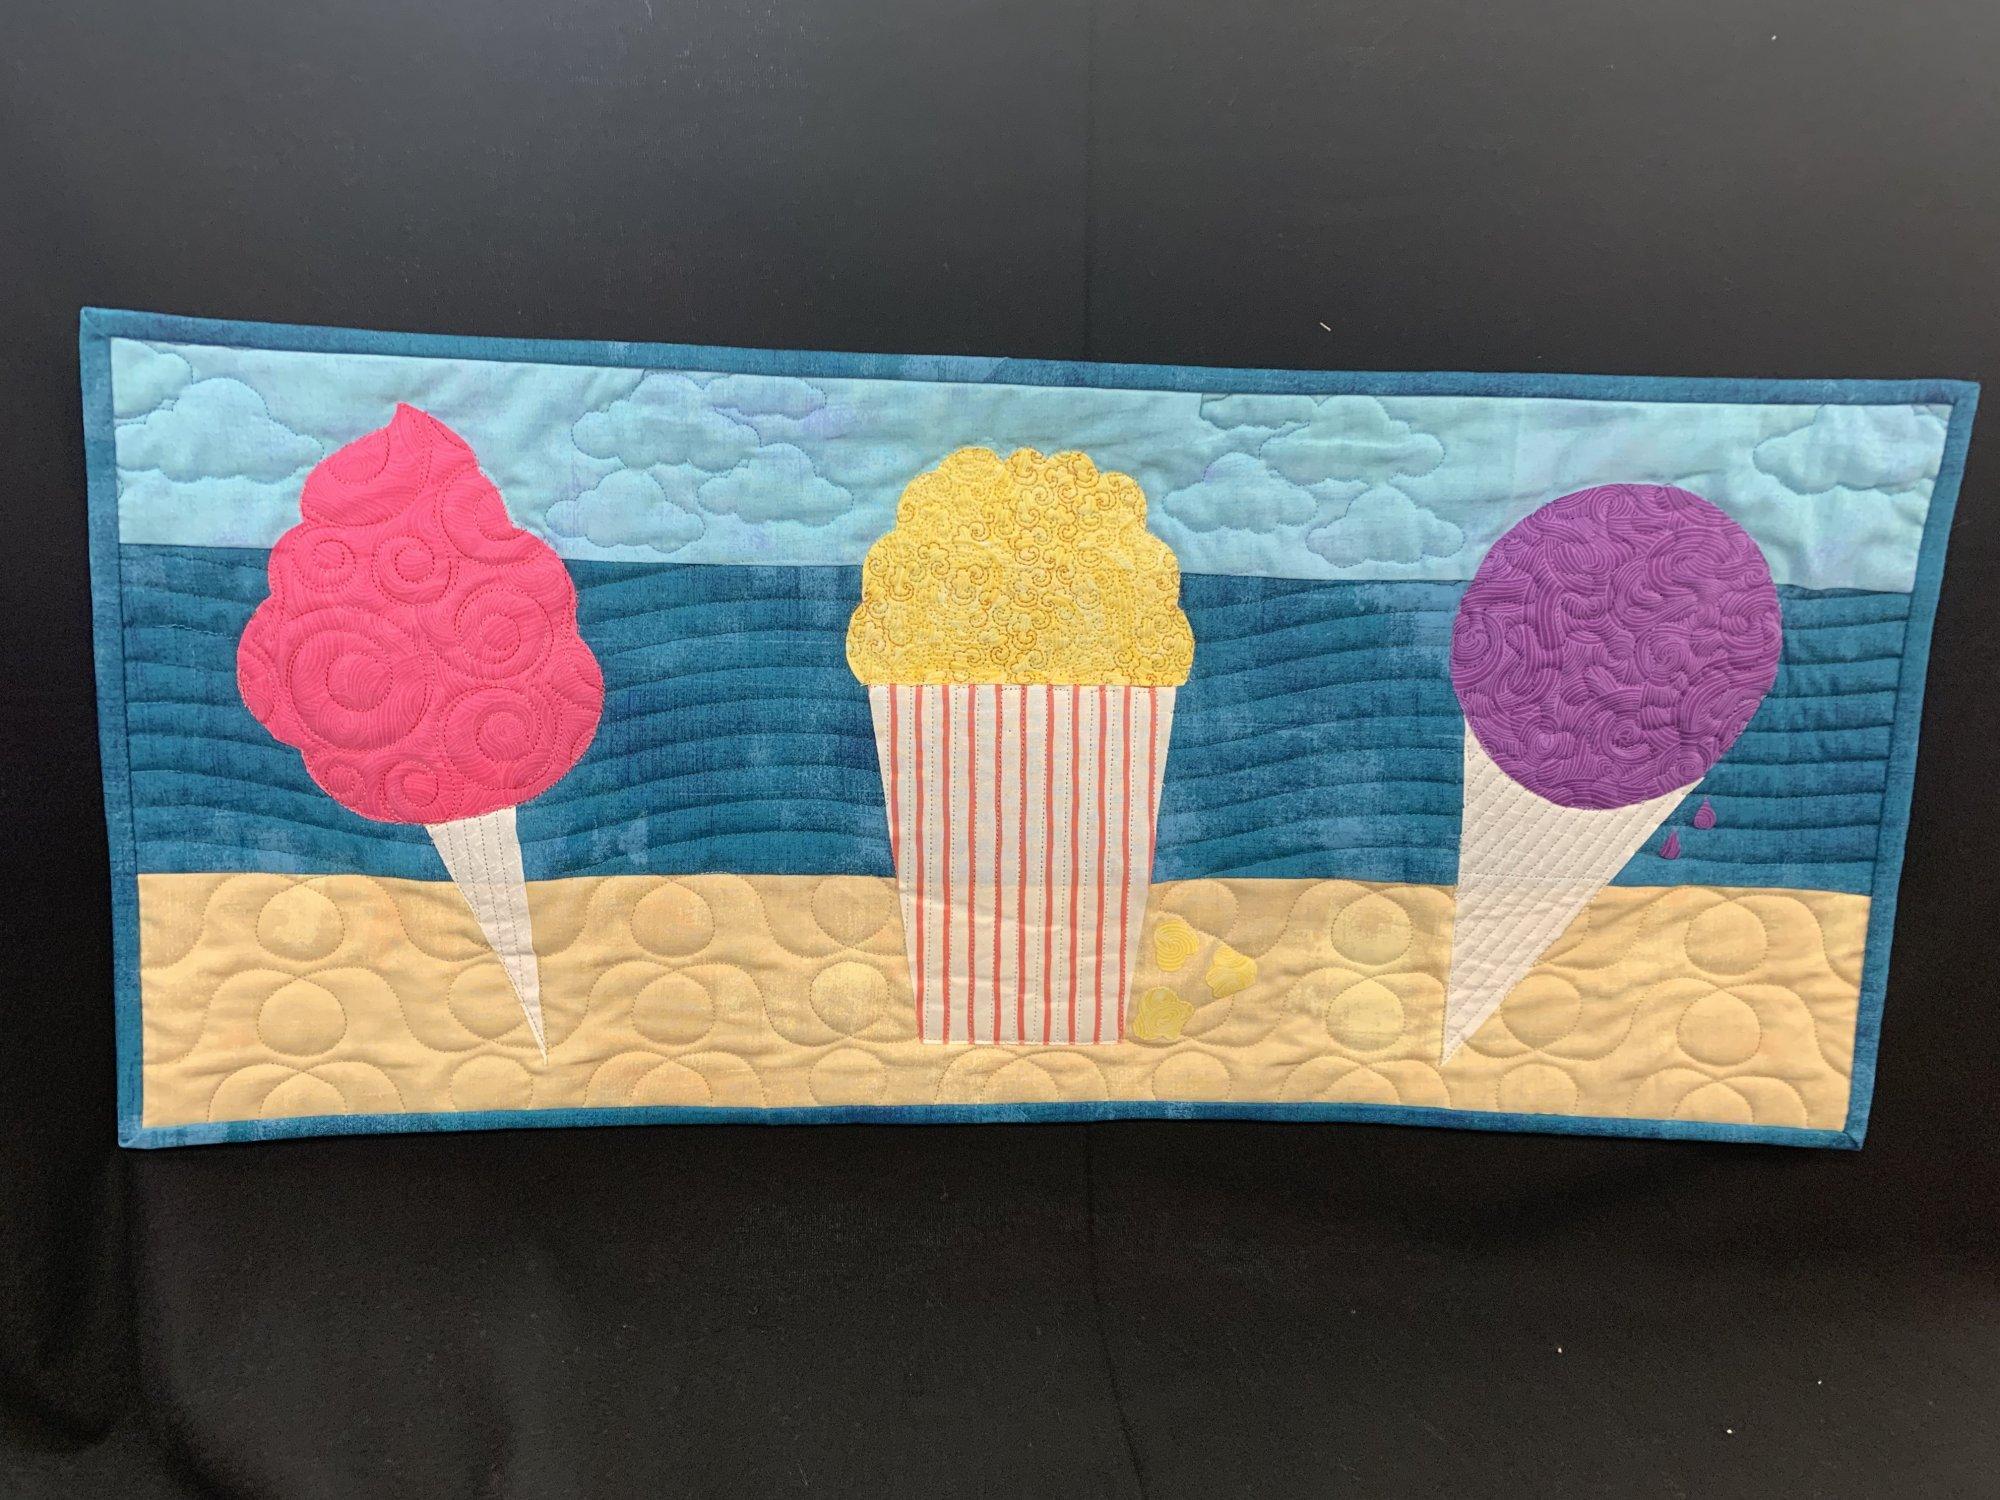 2019 Cotton Candy Fabrics Row by Row Kit - Beach Themed